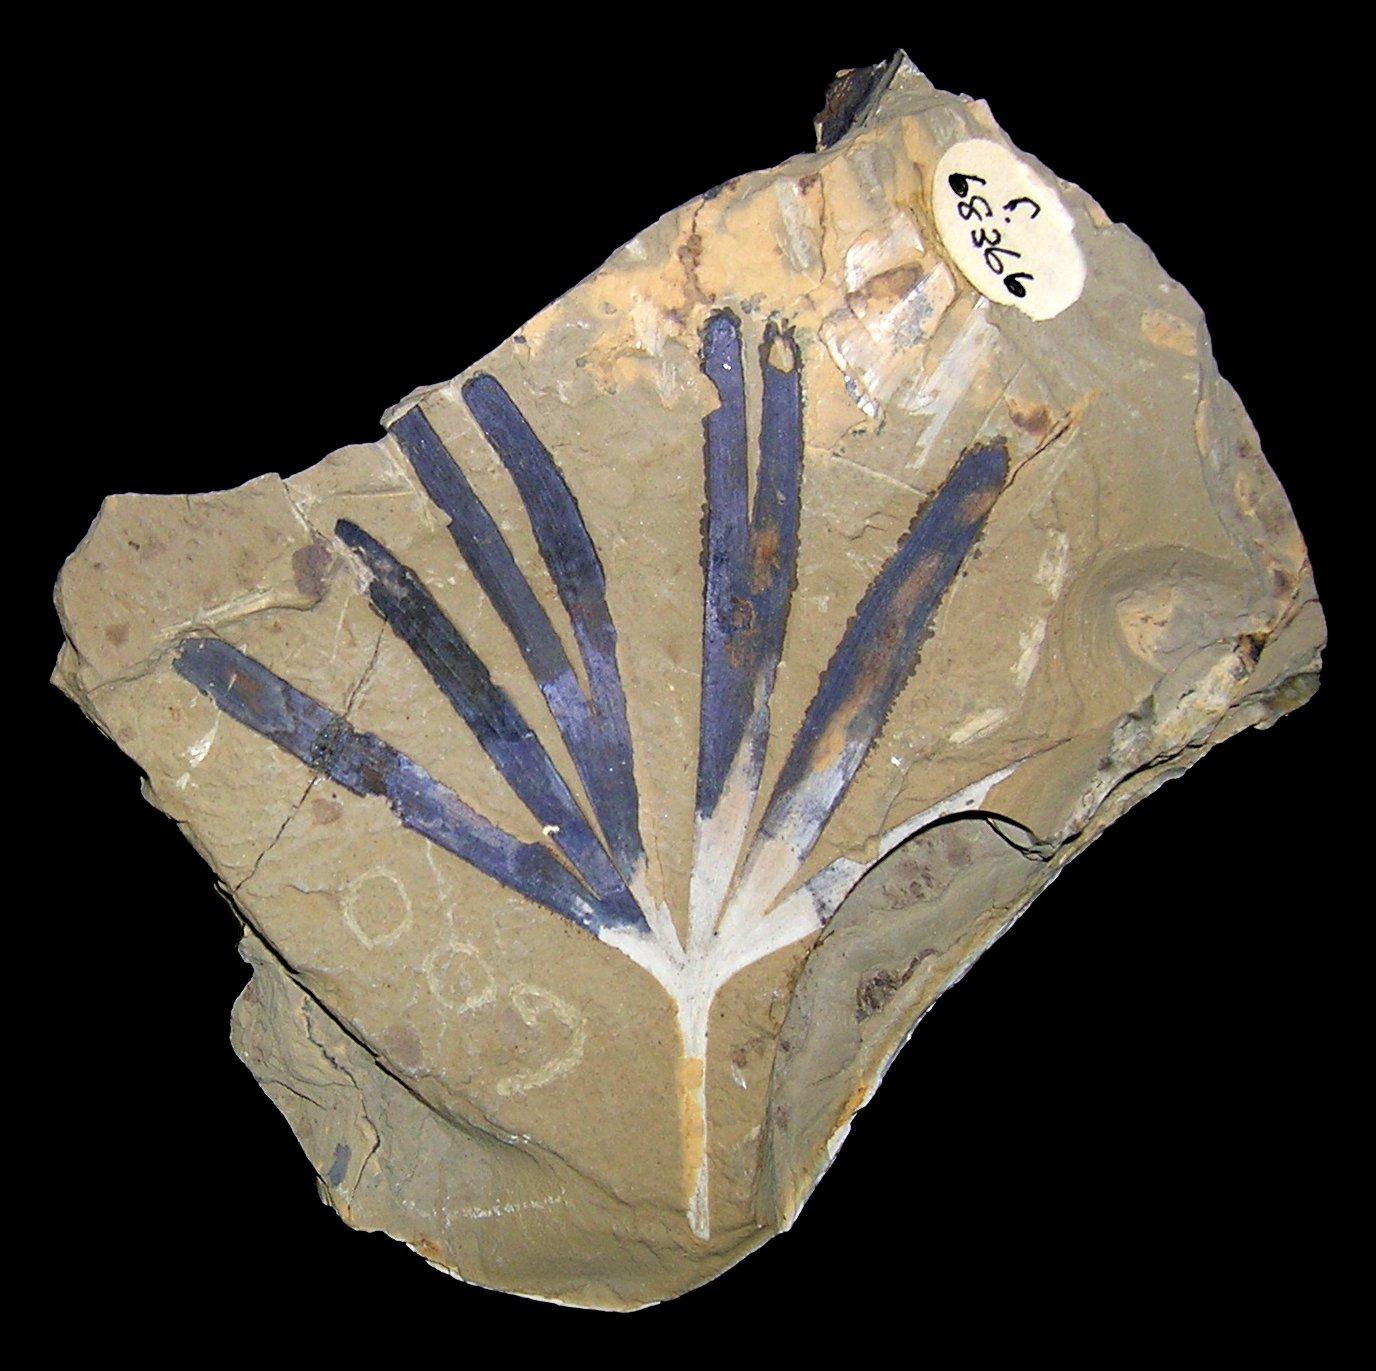 Fossil of Ginkgo tree, Ginkgoites australis